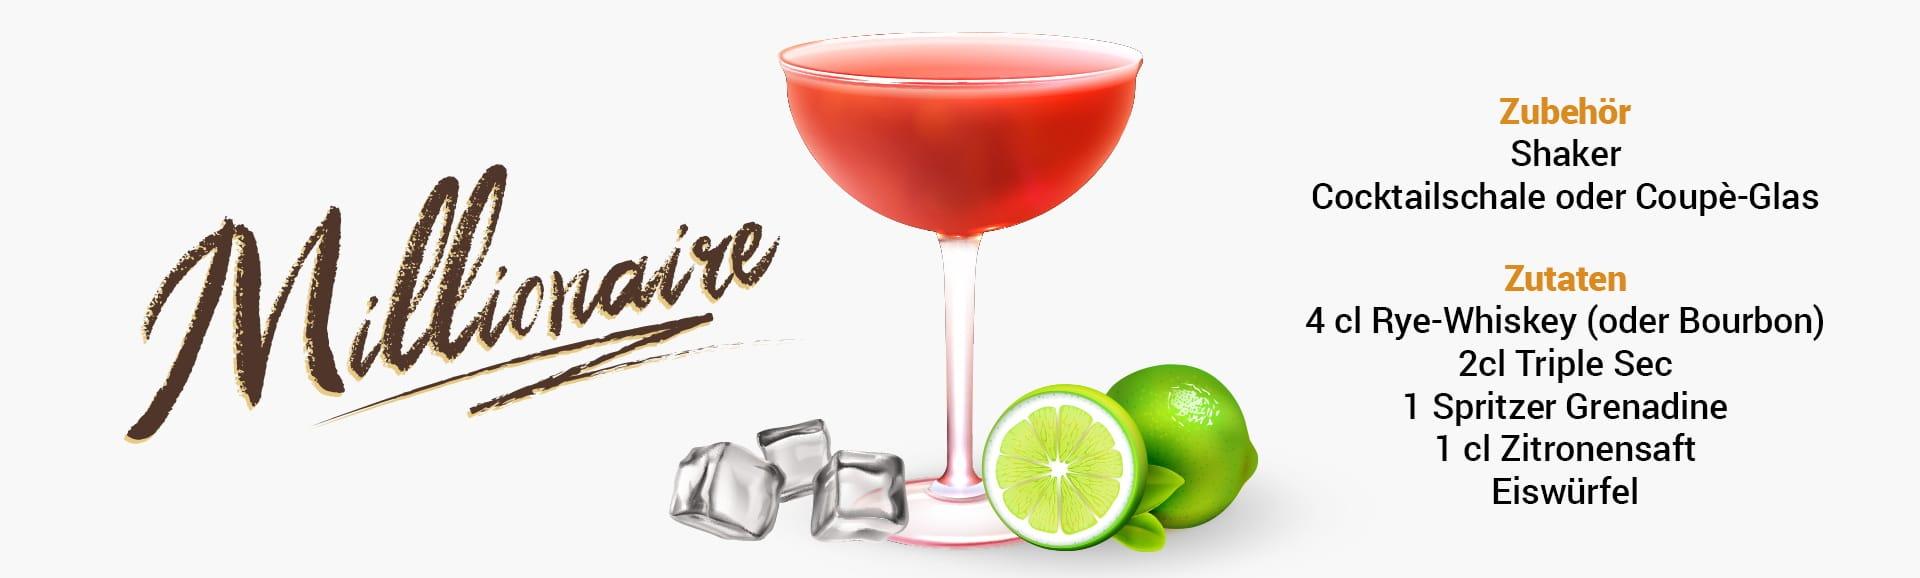 Whisky Cocktail: Millionaire Rezept + Tipp